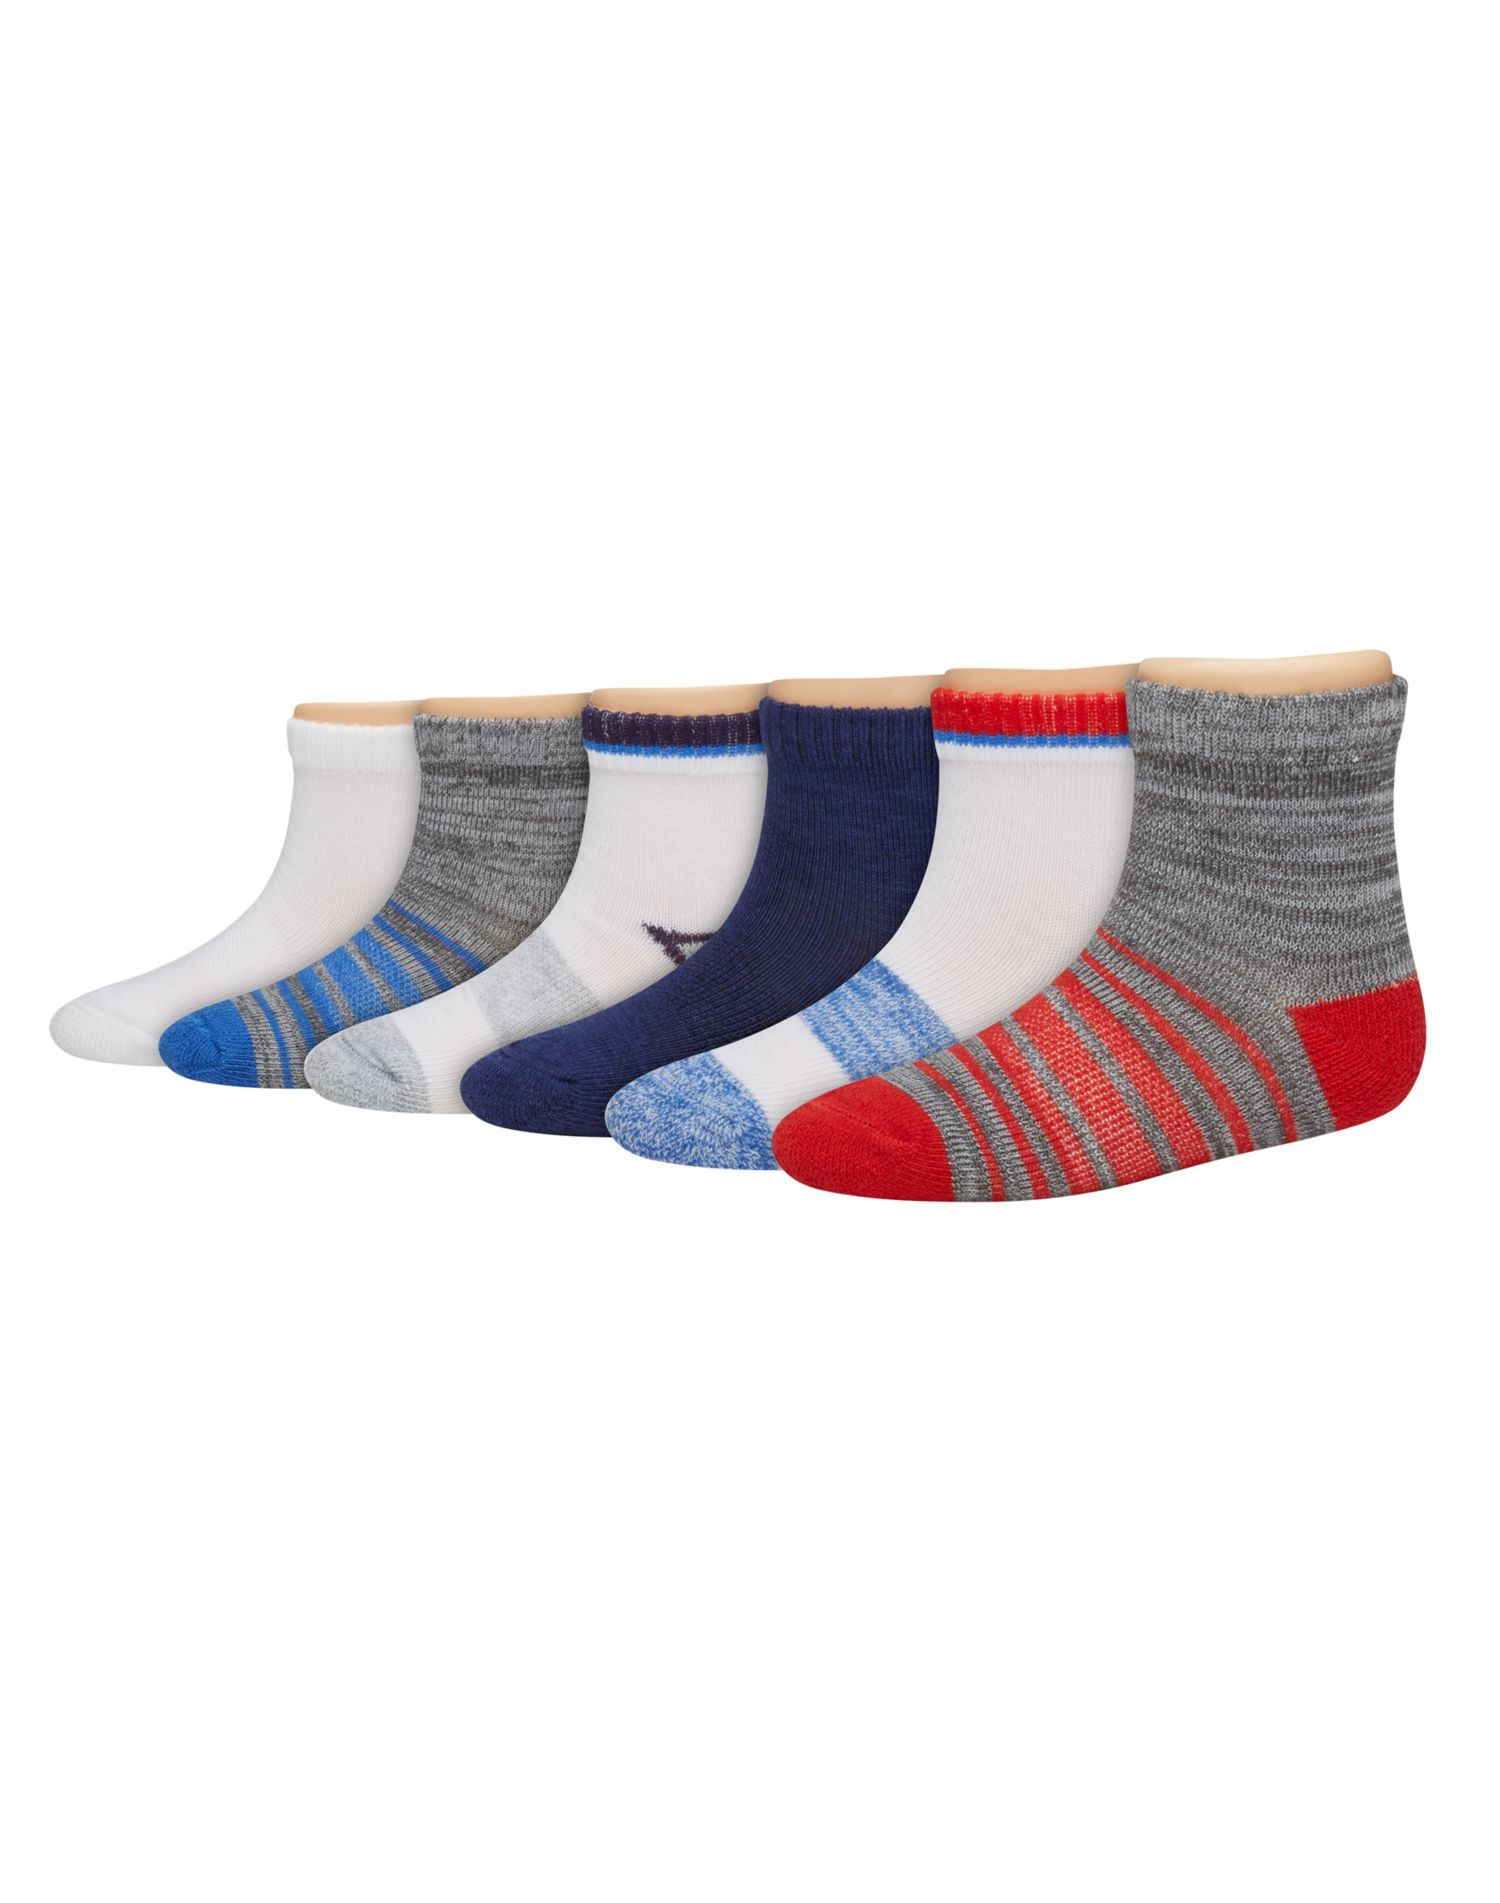 Hanes Boys/' Toddler 6-Pack Ankle Socks Assorted 4T-5T